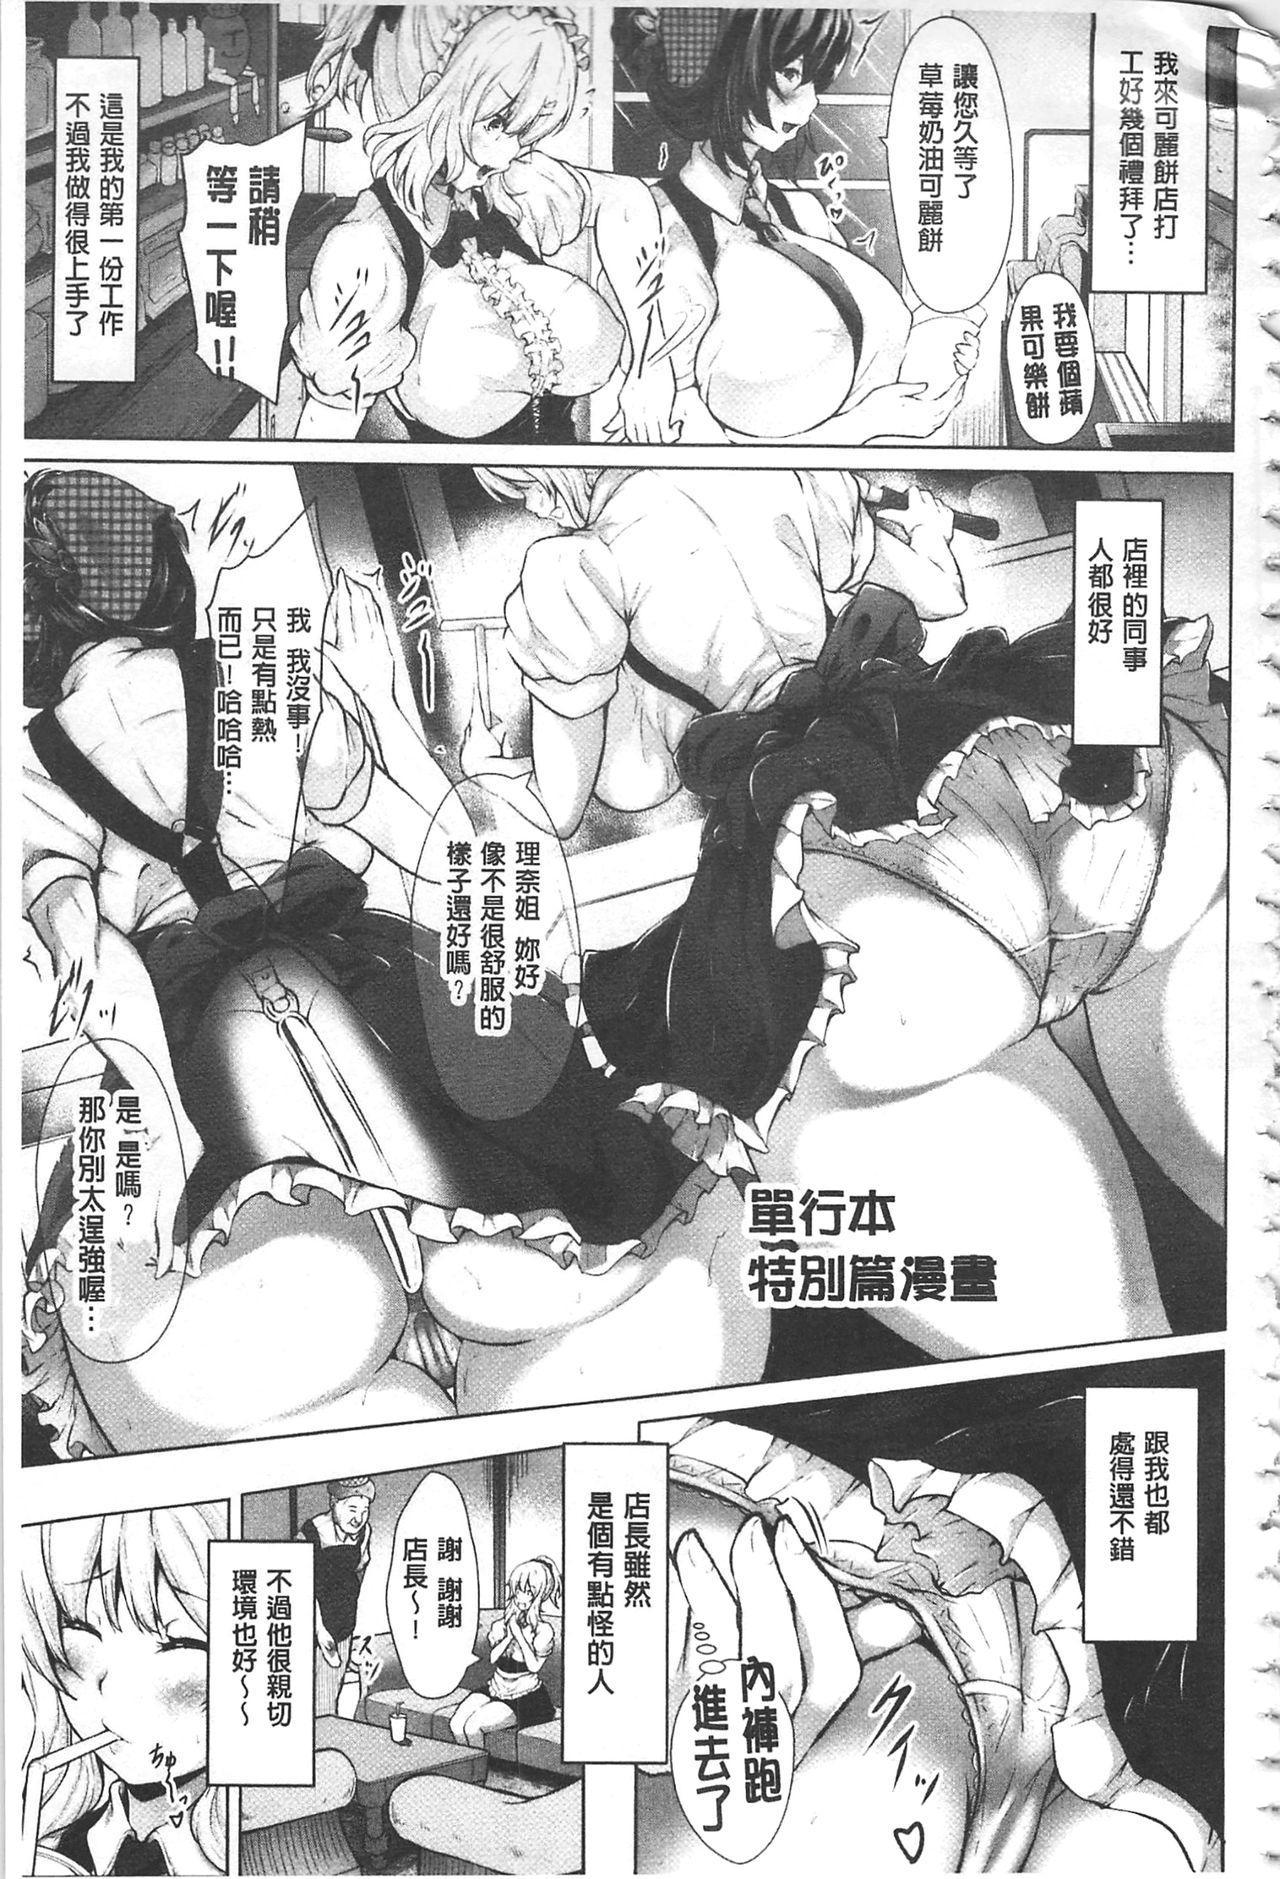 [Lorica] Biinkan Anal ~Kakusei Nejikomi Ana~ | 美淫感猥菊花 塞入擴張覺醒穴 [Chinese] 189